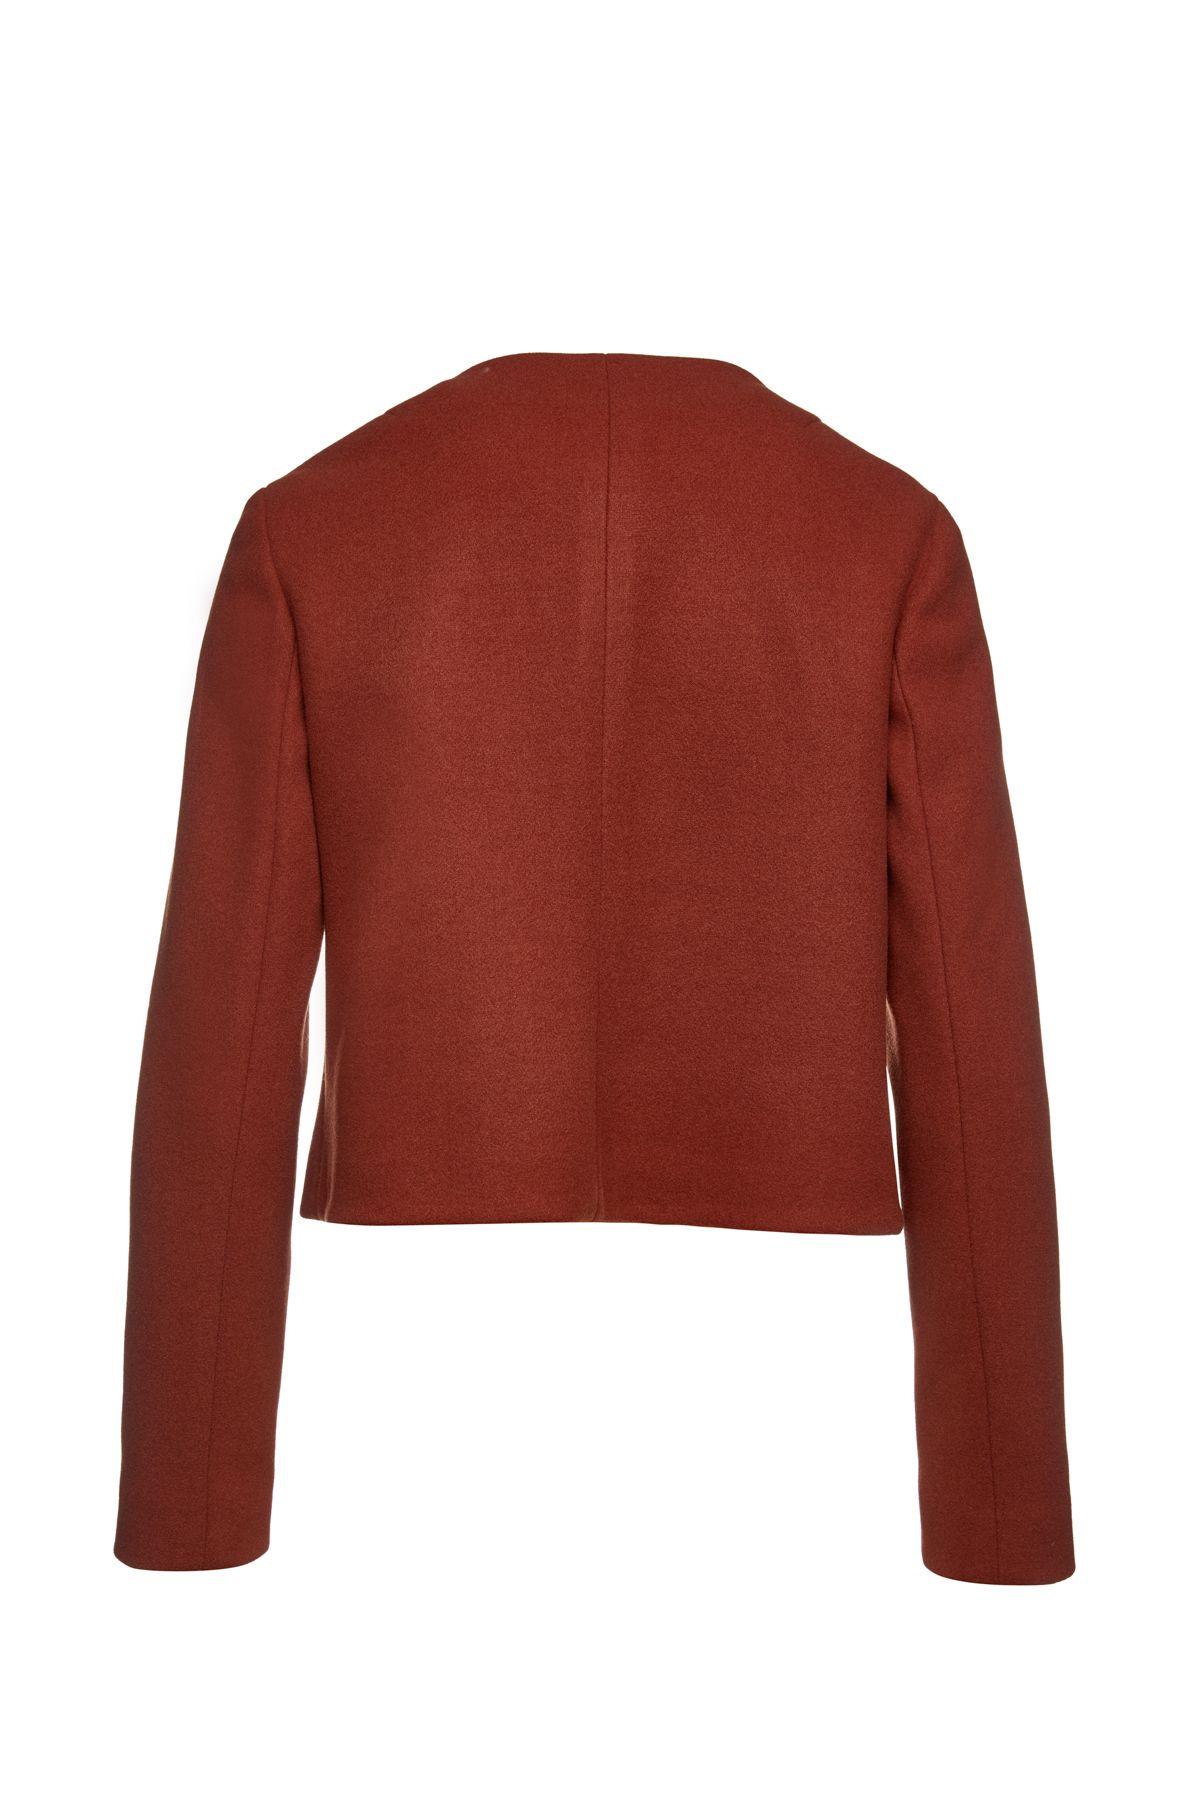 Brick Red Mouflon Winter Jacket